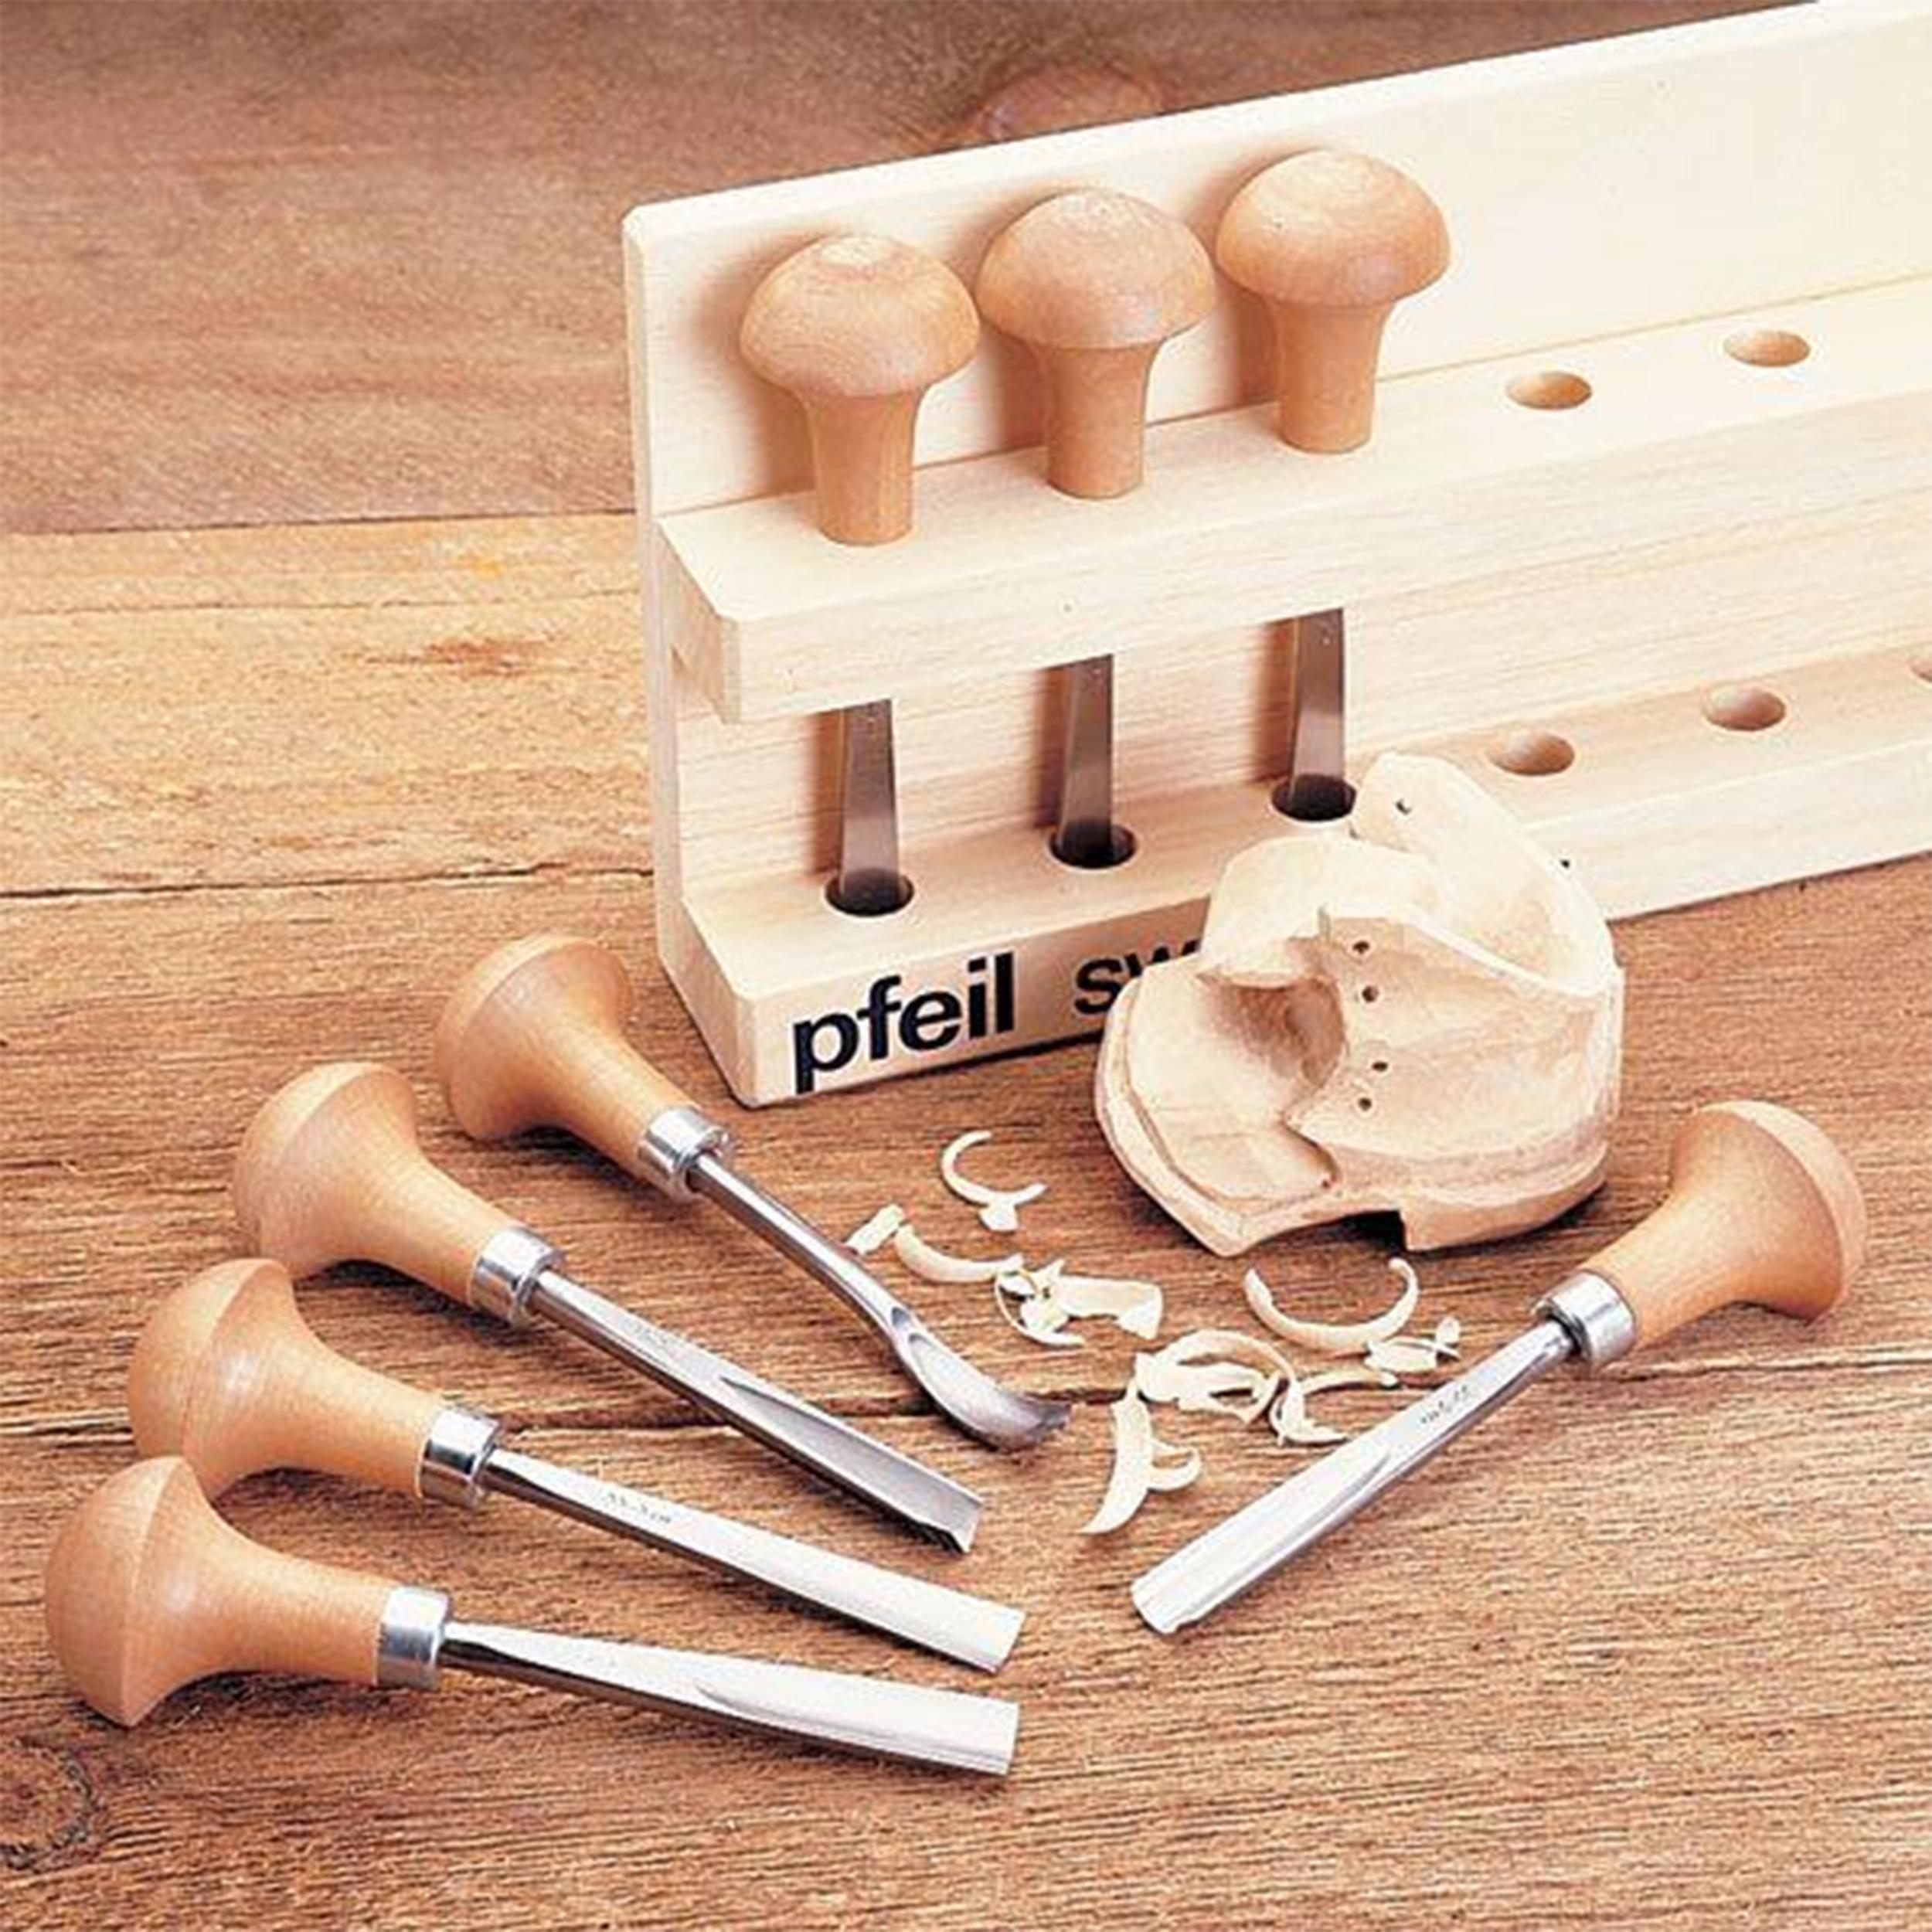 Palm Handled Carving Tool Set B, 8 piece